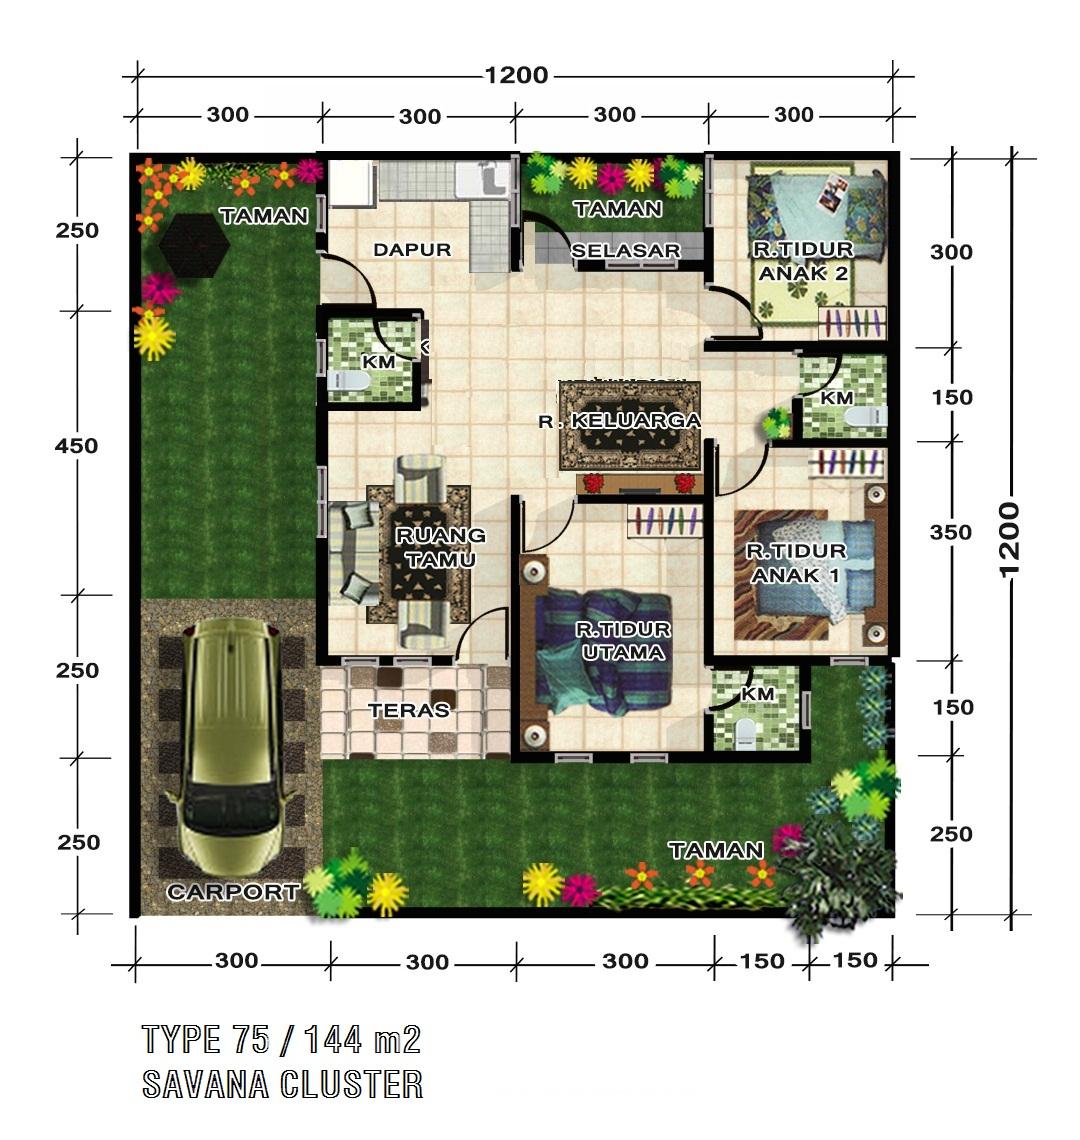 rumah minimalis type 75 144 di kawasan jalan arifin ahmad